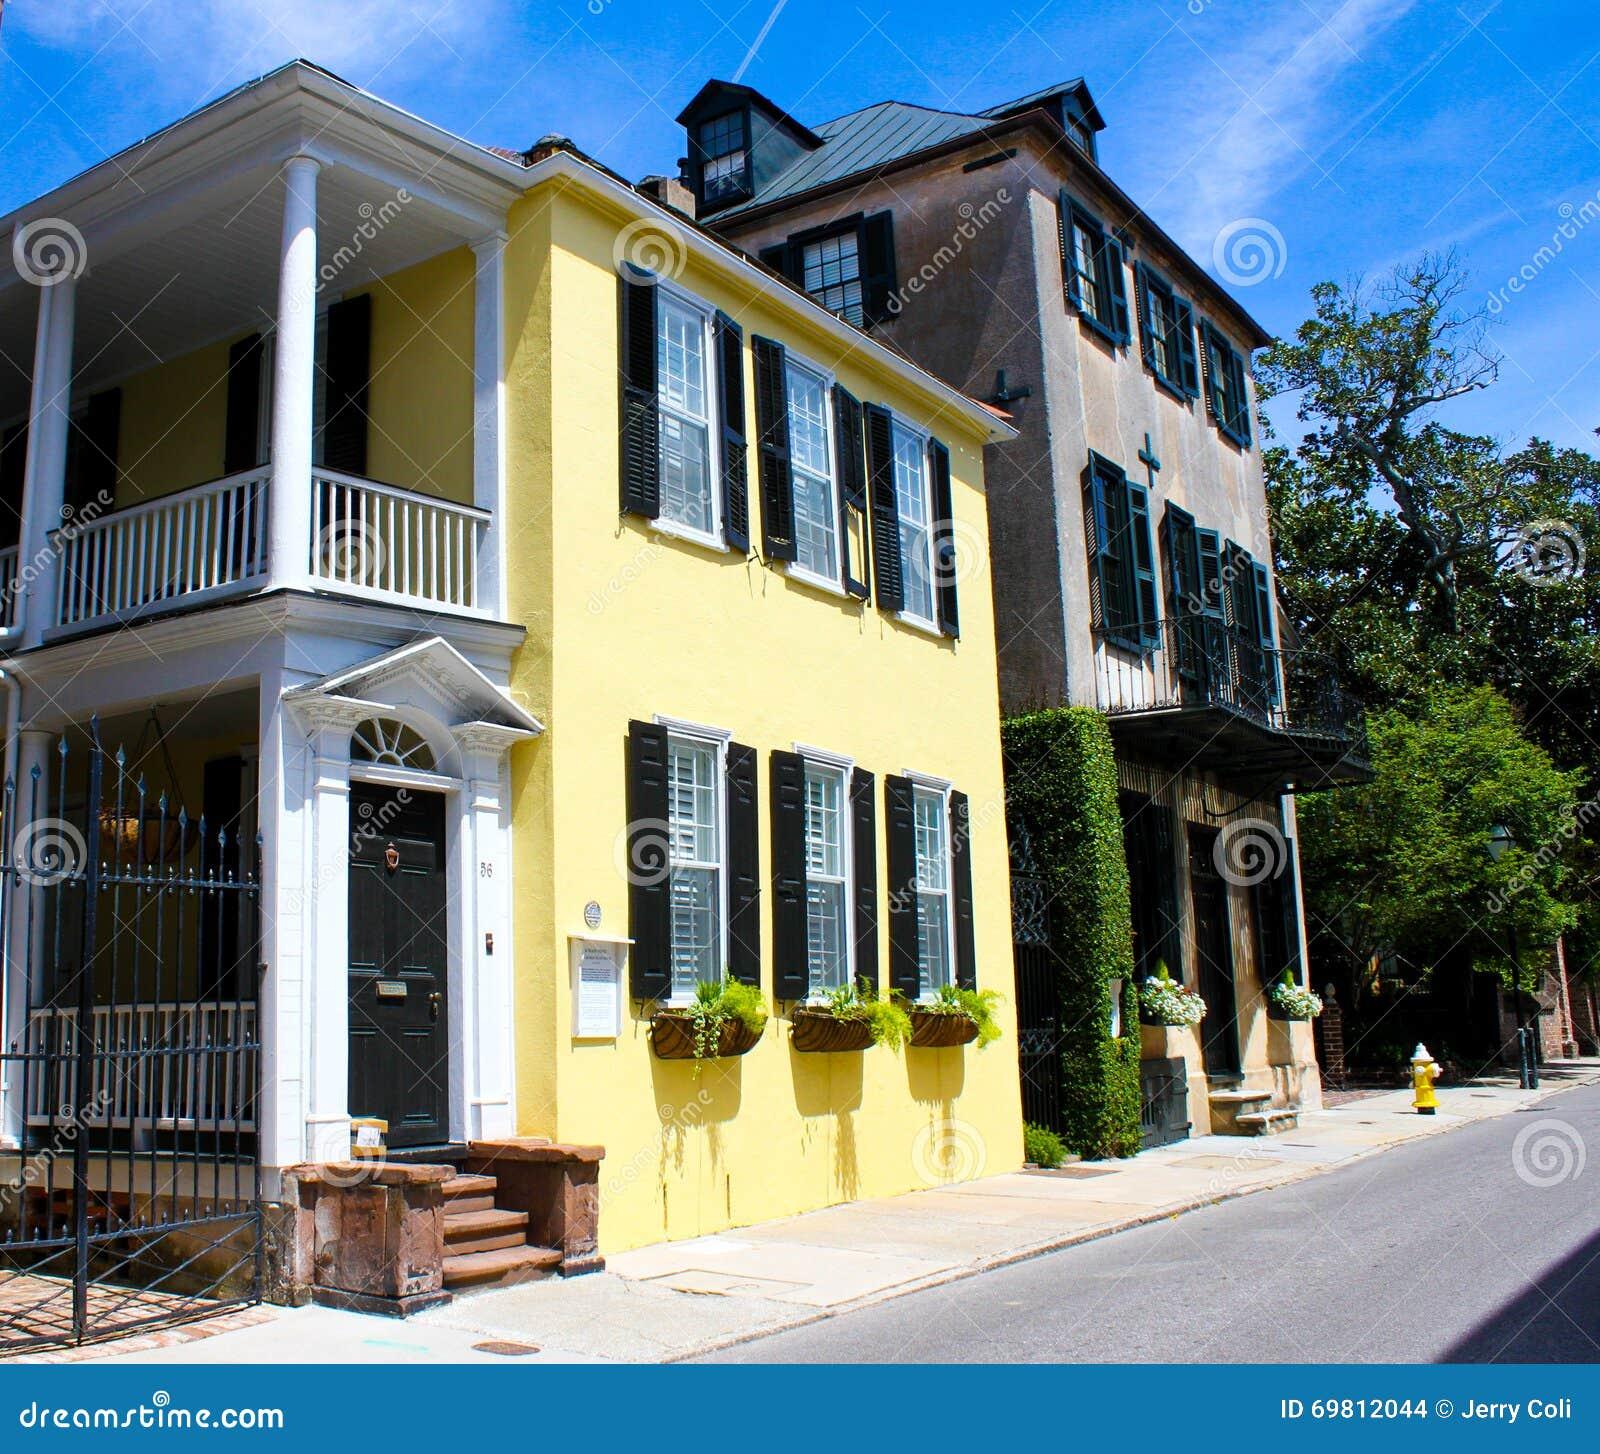 Charleston Sc Homes: Historic Tradd Street, Charleston, SC. Editorial Stock